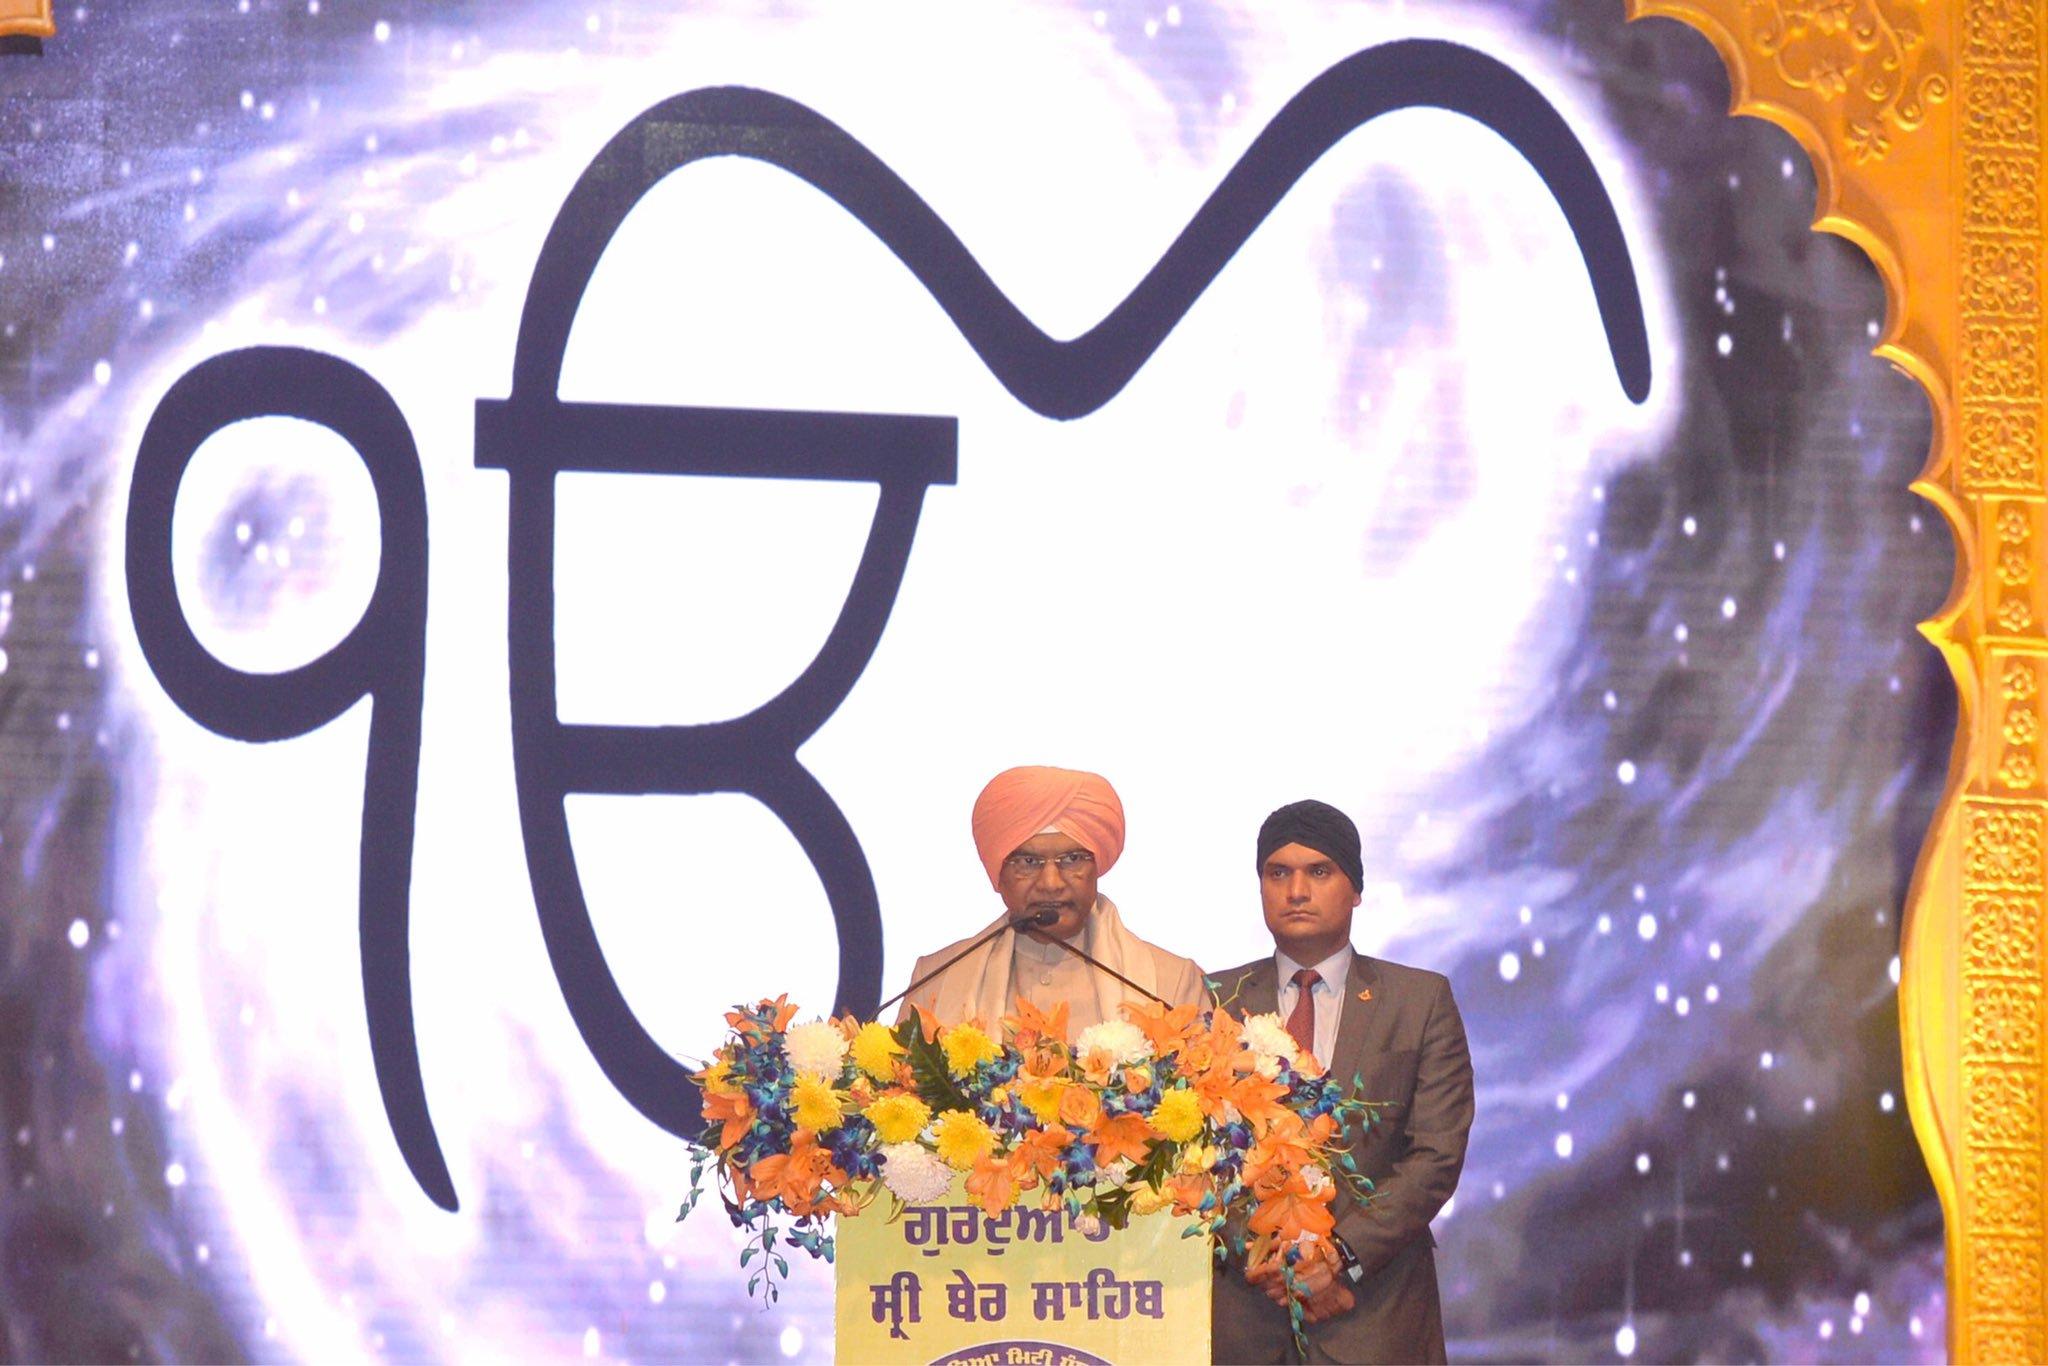 President attends Guru Nanak Jayanti celebrations at Sultanpur Lodhi